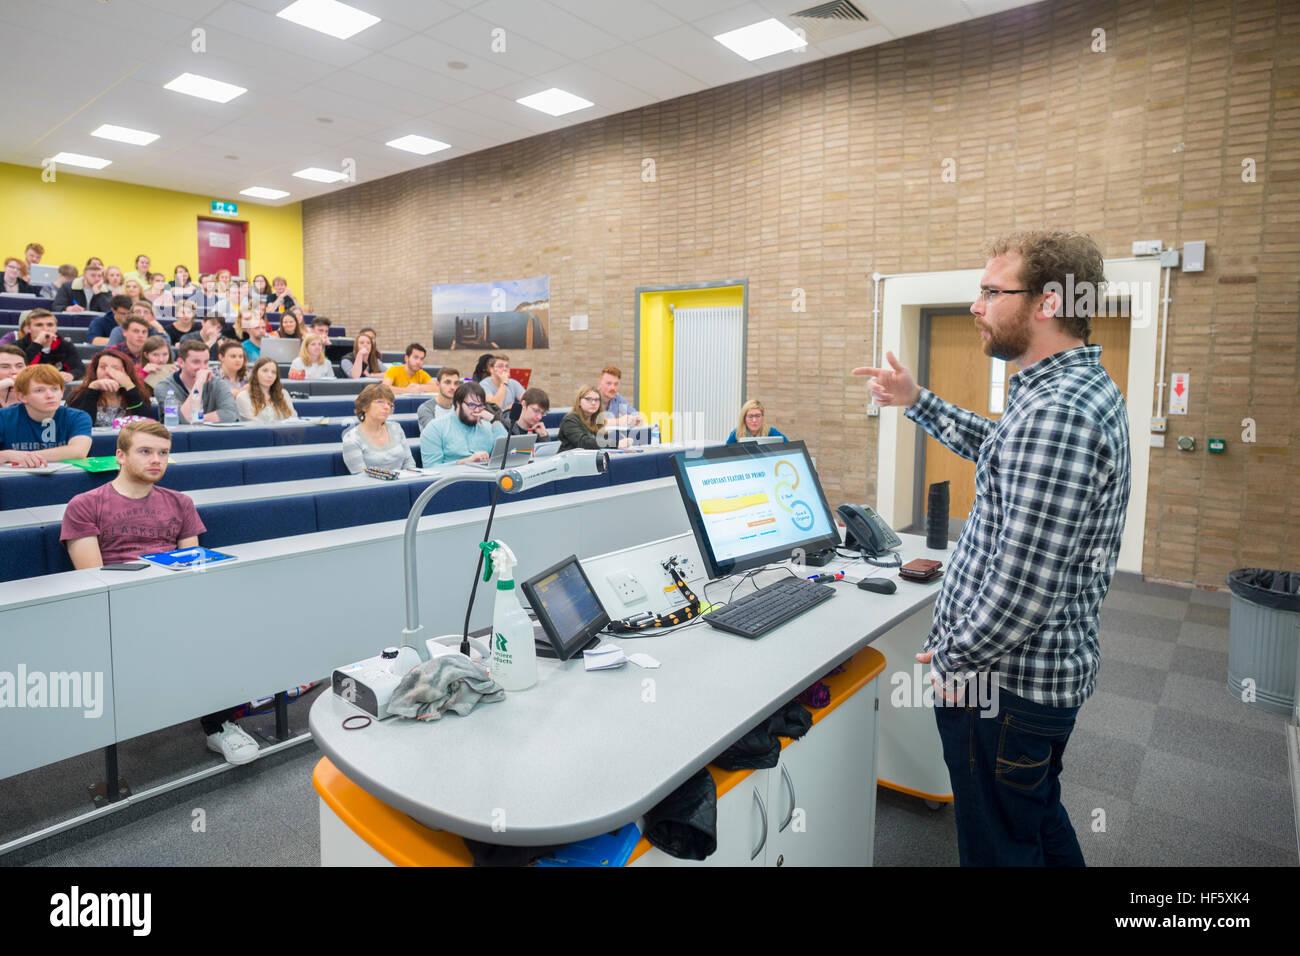 Aberystwyth University Student Room